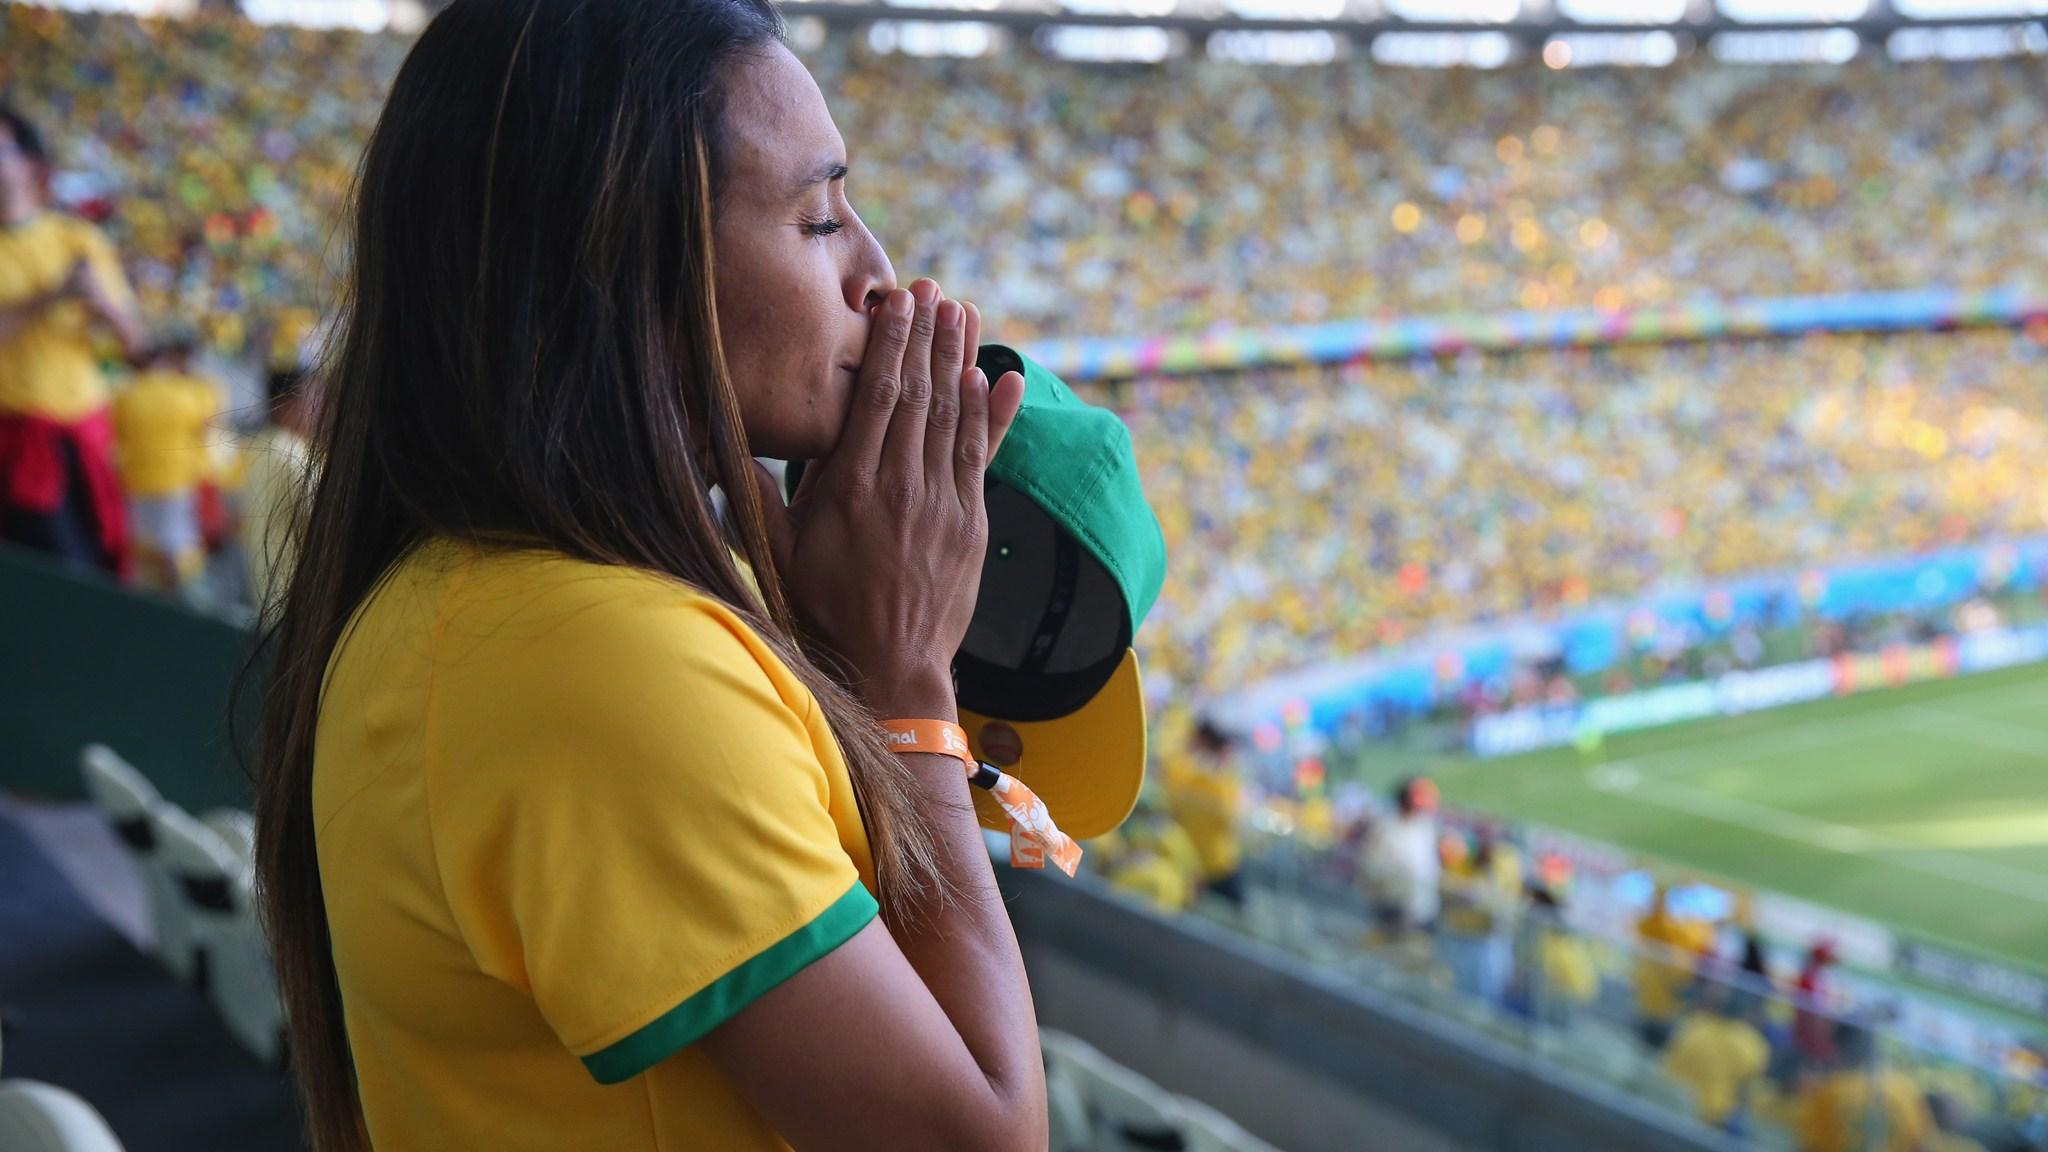 210 - Brazil-Colombia [2-1] -- 04 Jul 2014 - 17-00 - kuaza